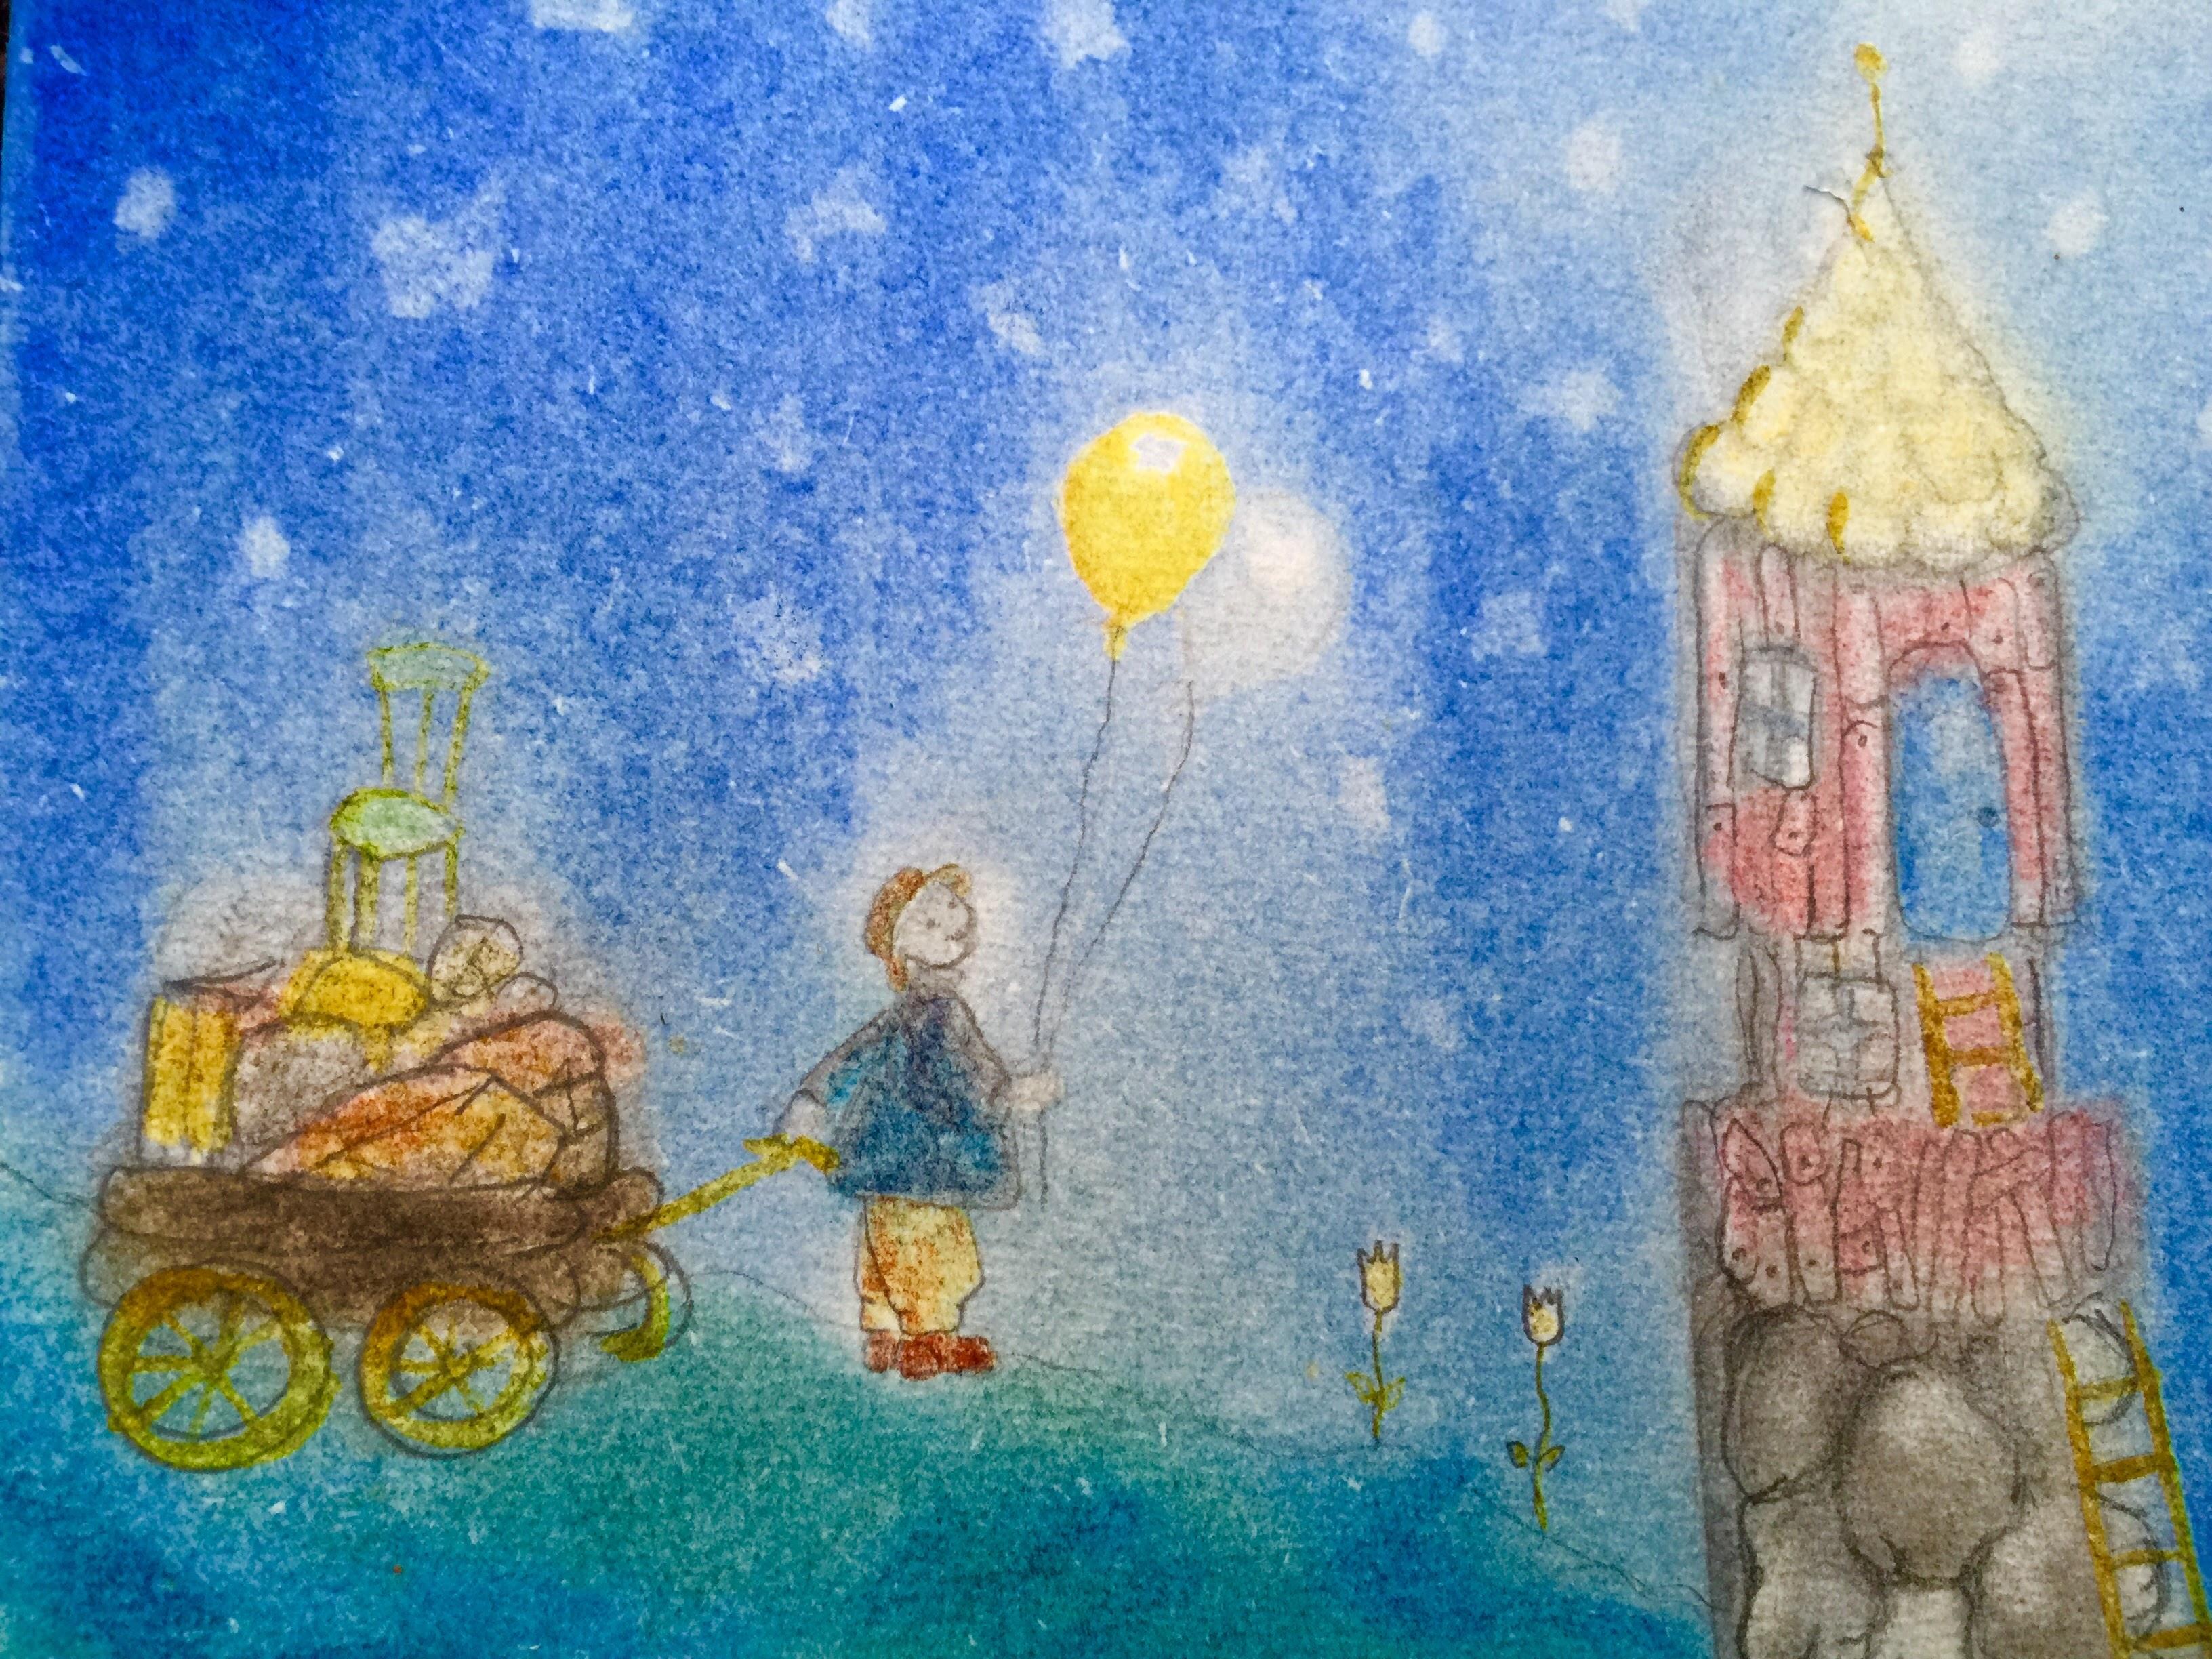 Ballongpojke med flyttlass. Teckning